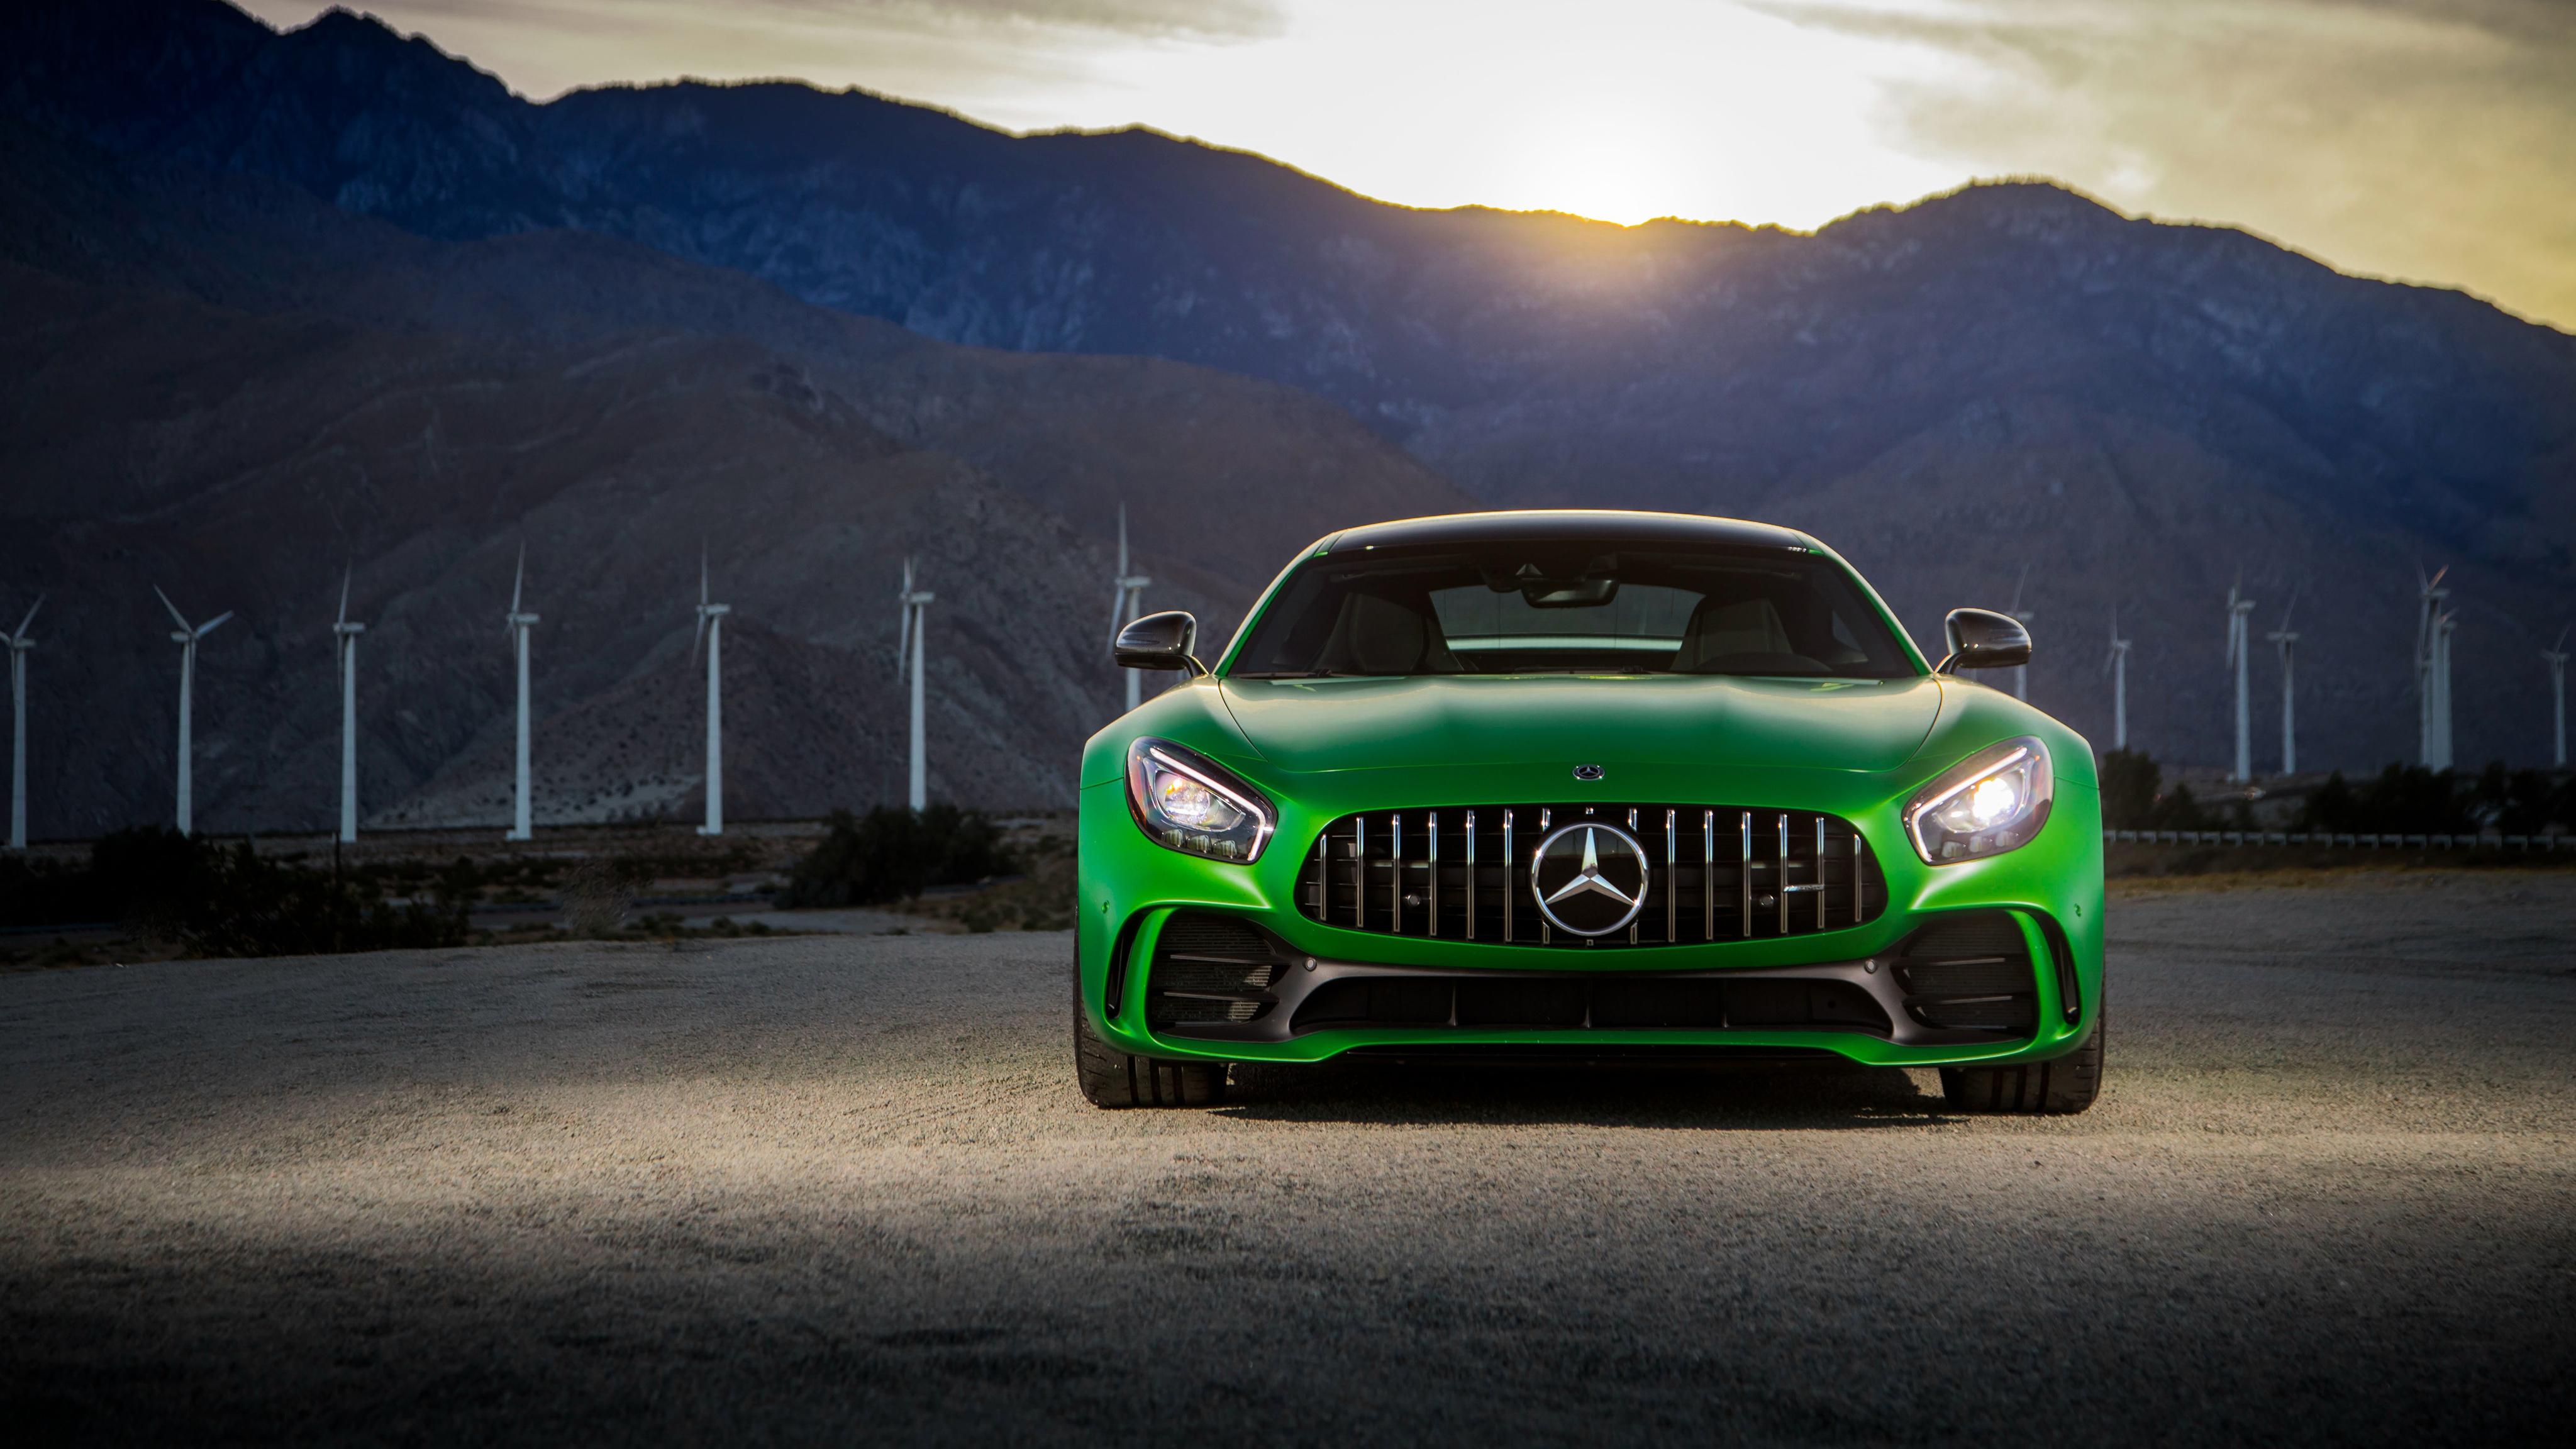 2018 Mercedes Amg Gt R 4k Wallpaper Hd Car Wallpapers